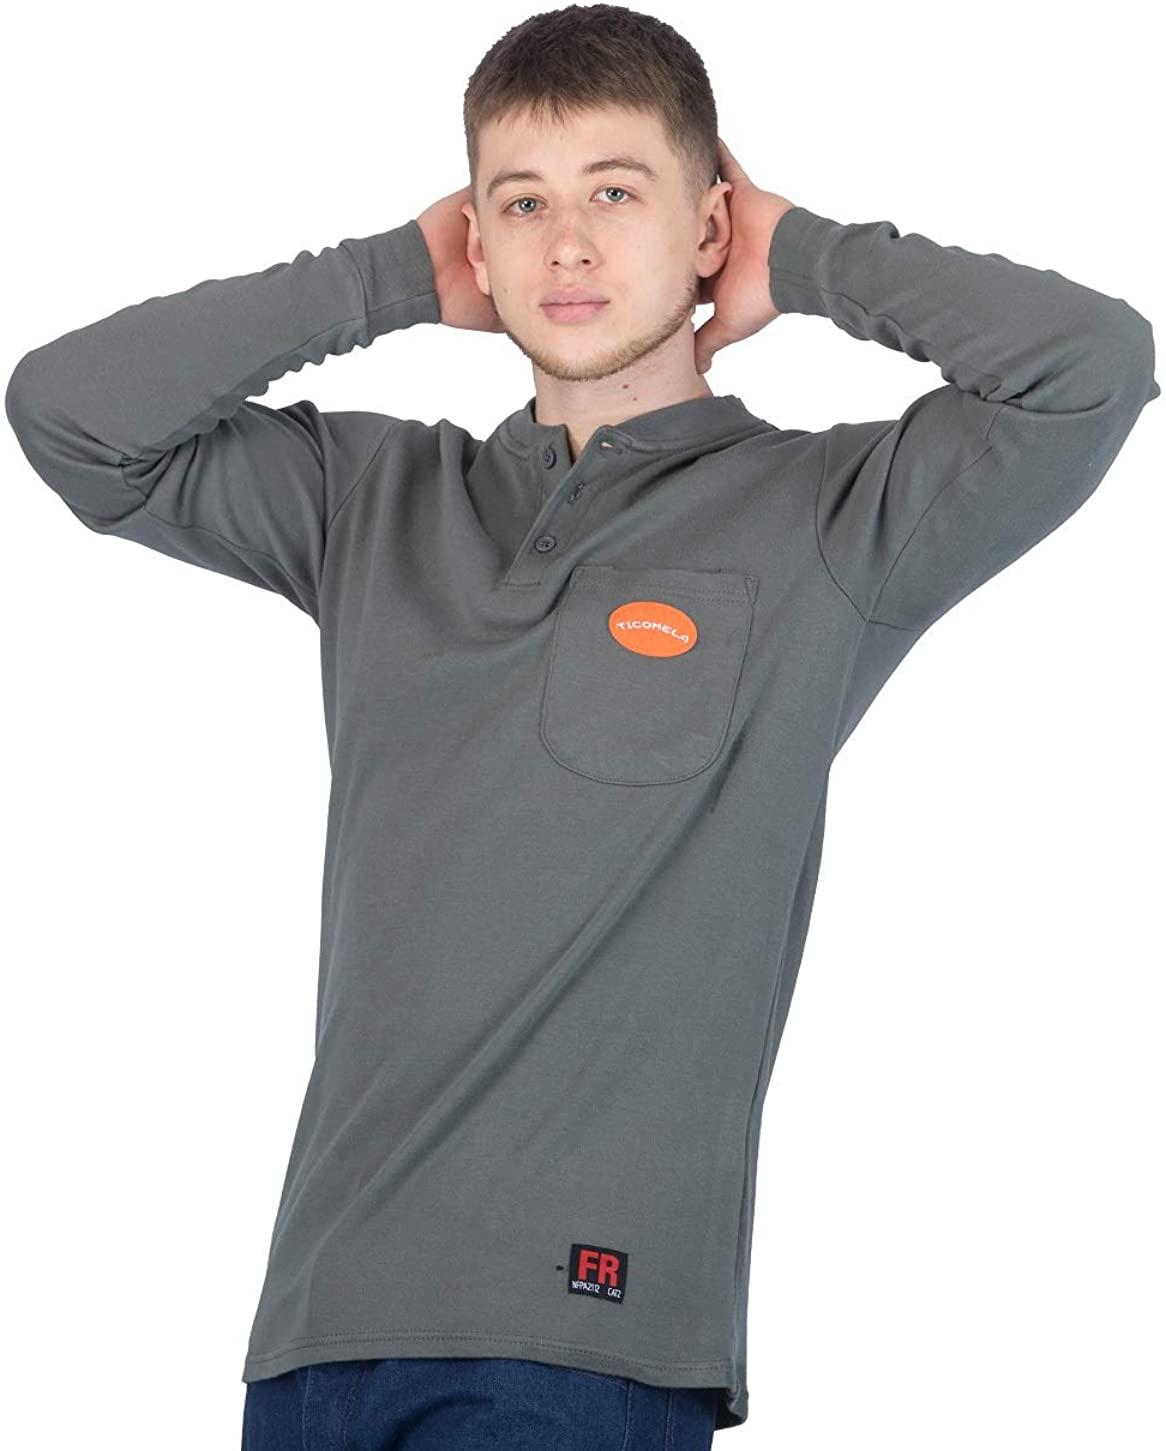 TICOMELA FR Shirts for Men Flame Resistant Shirt NFPA2112 7oz Light Weight Work Mens Long Sleeve Henley Shirts